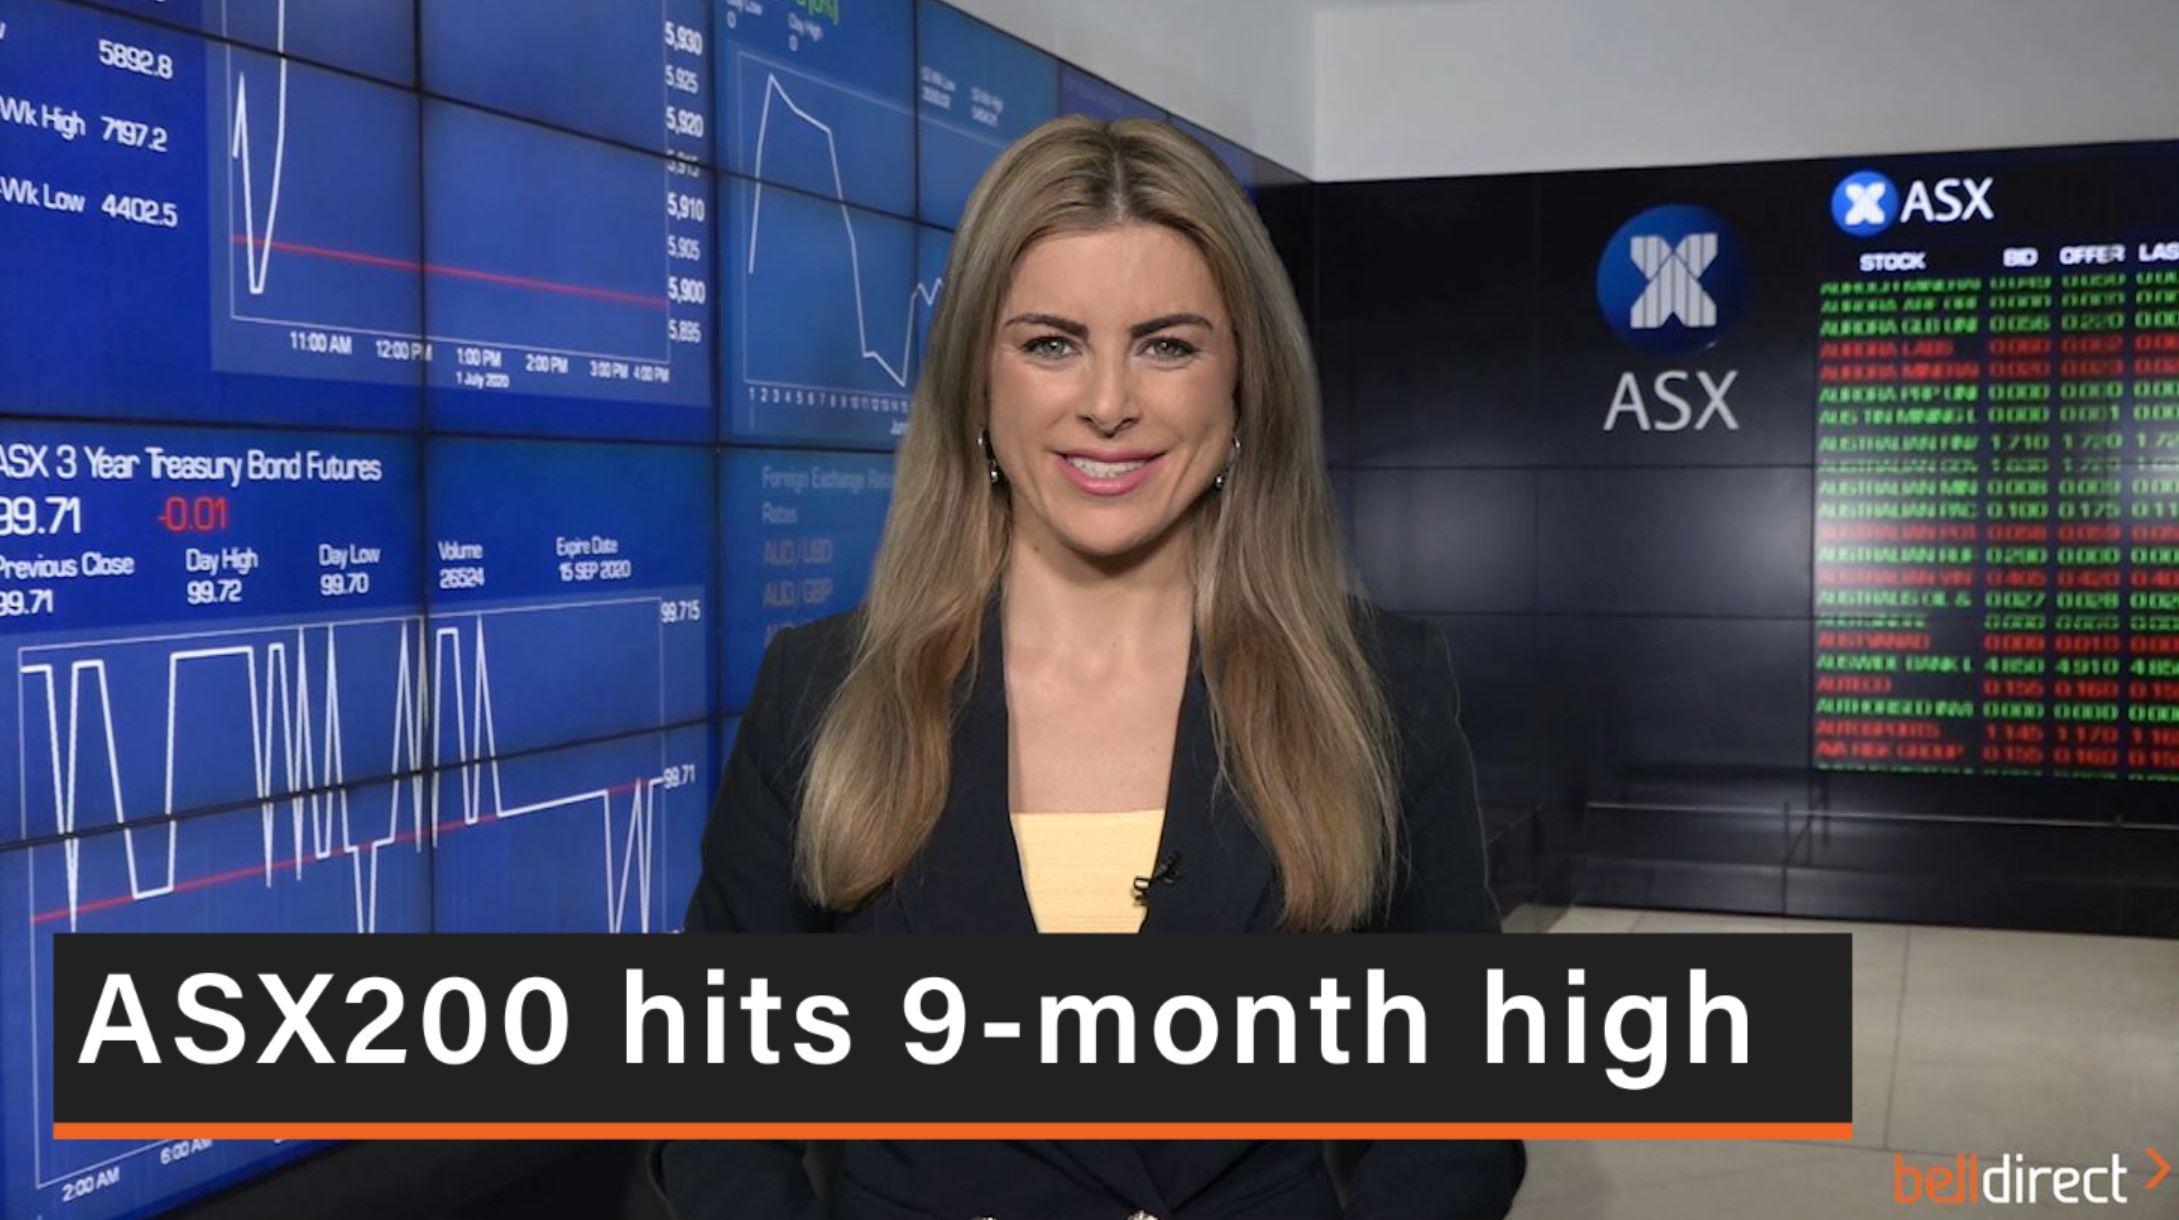 ASX200 hits a 9-month high